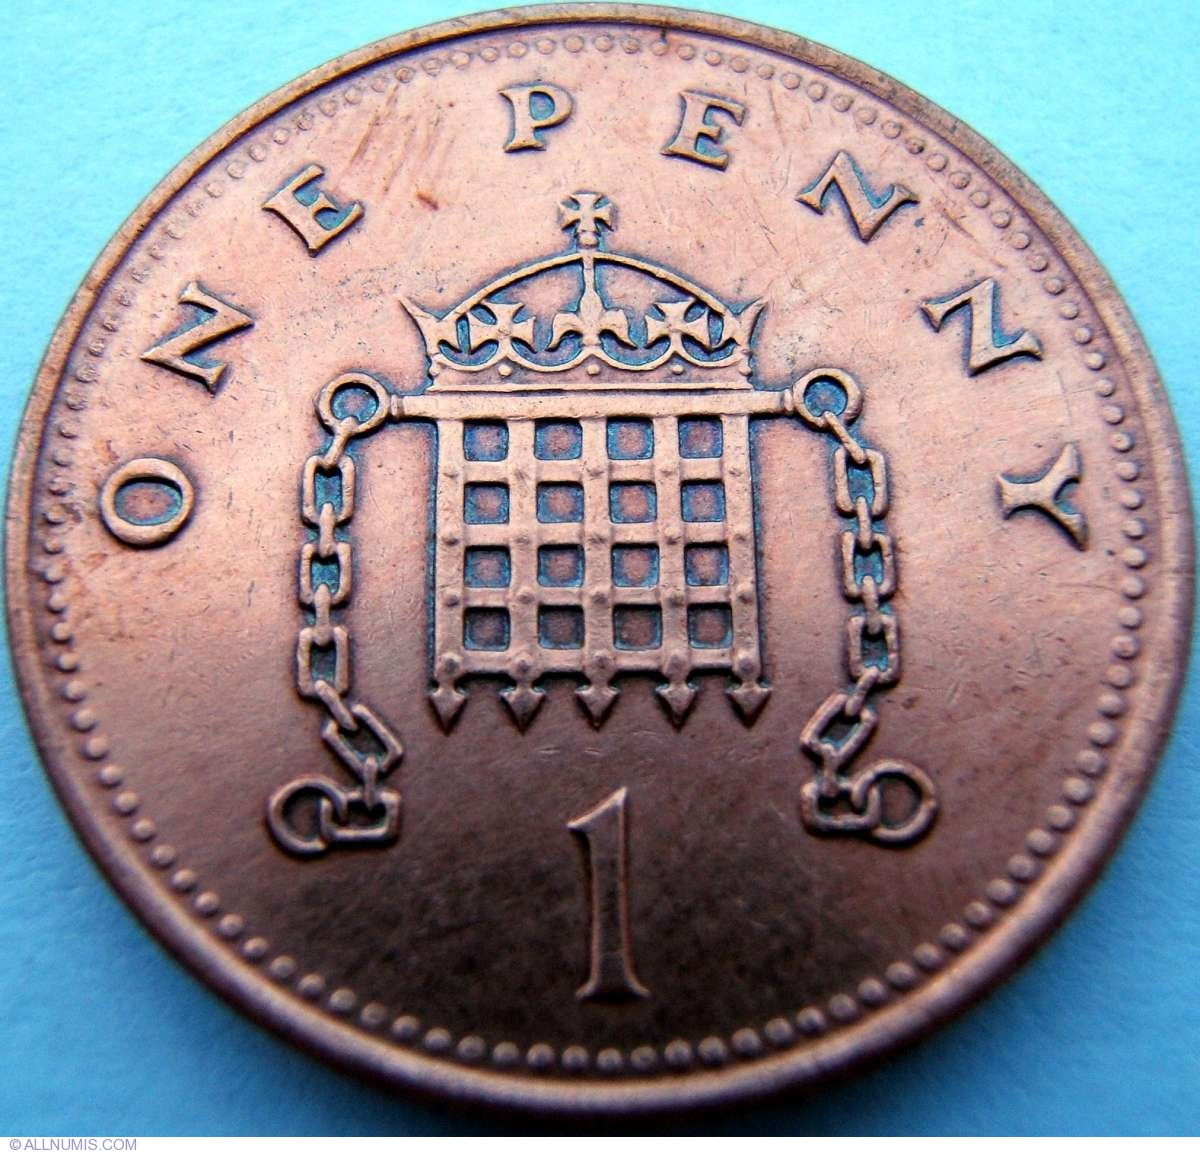 1 Penny 1993, Elizabeth II (1952-present) - Great Britain